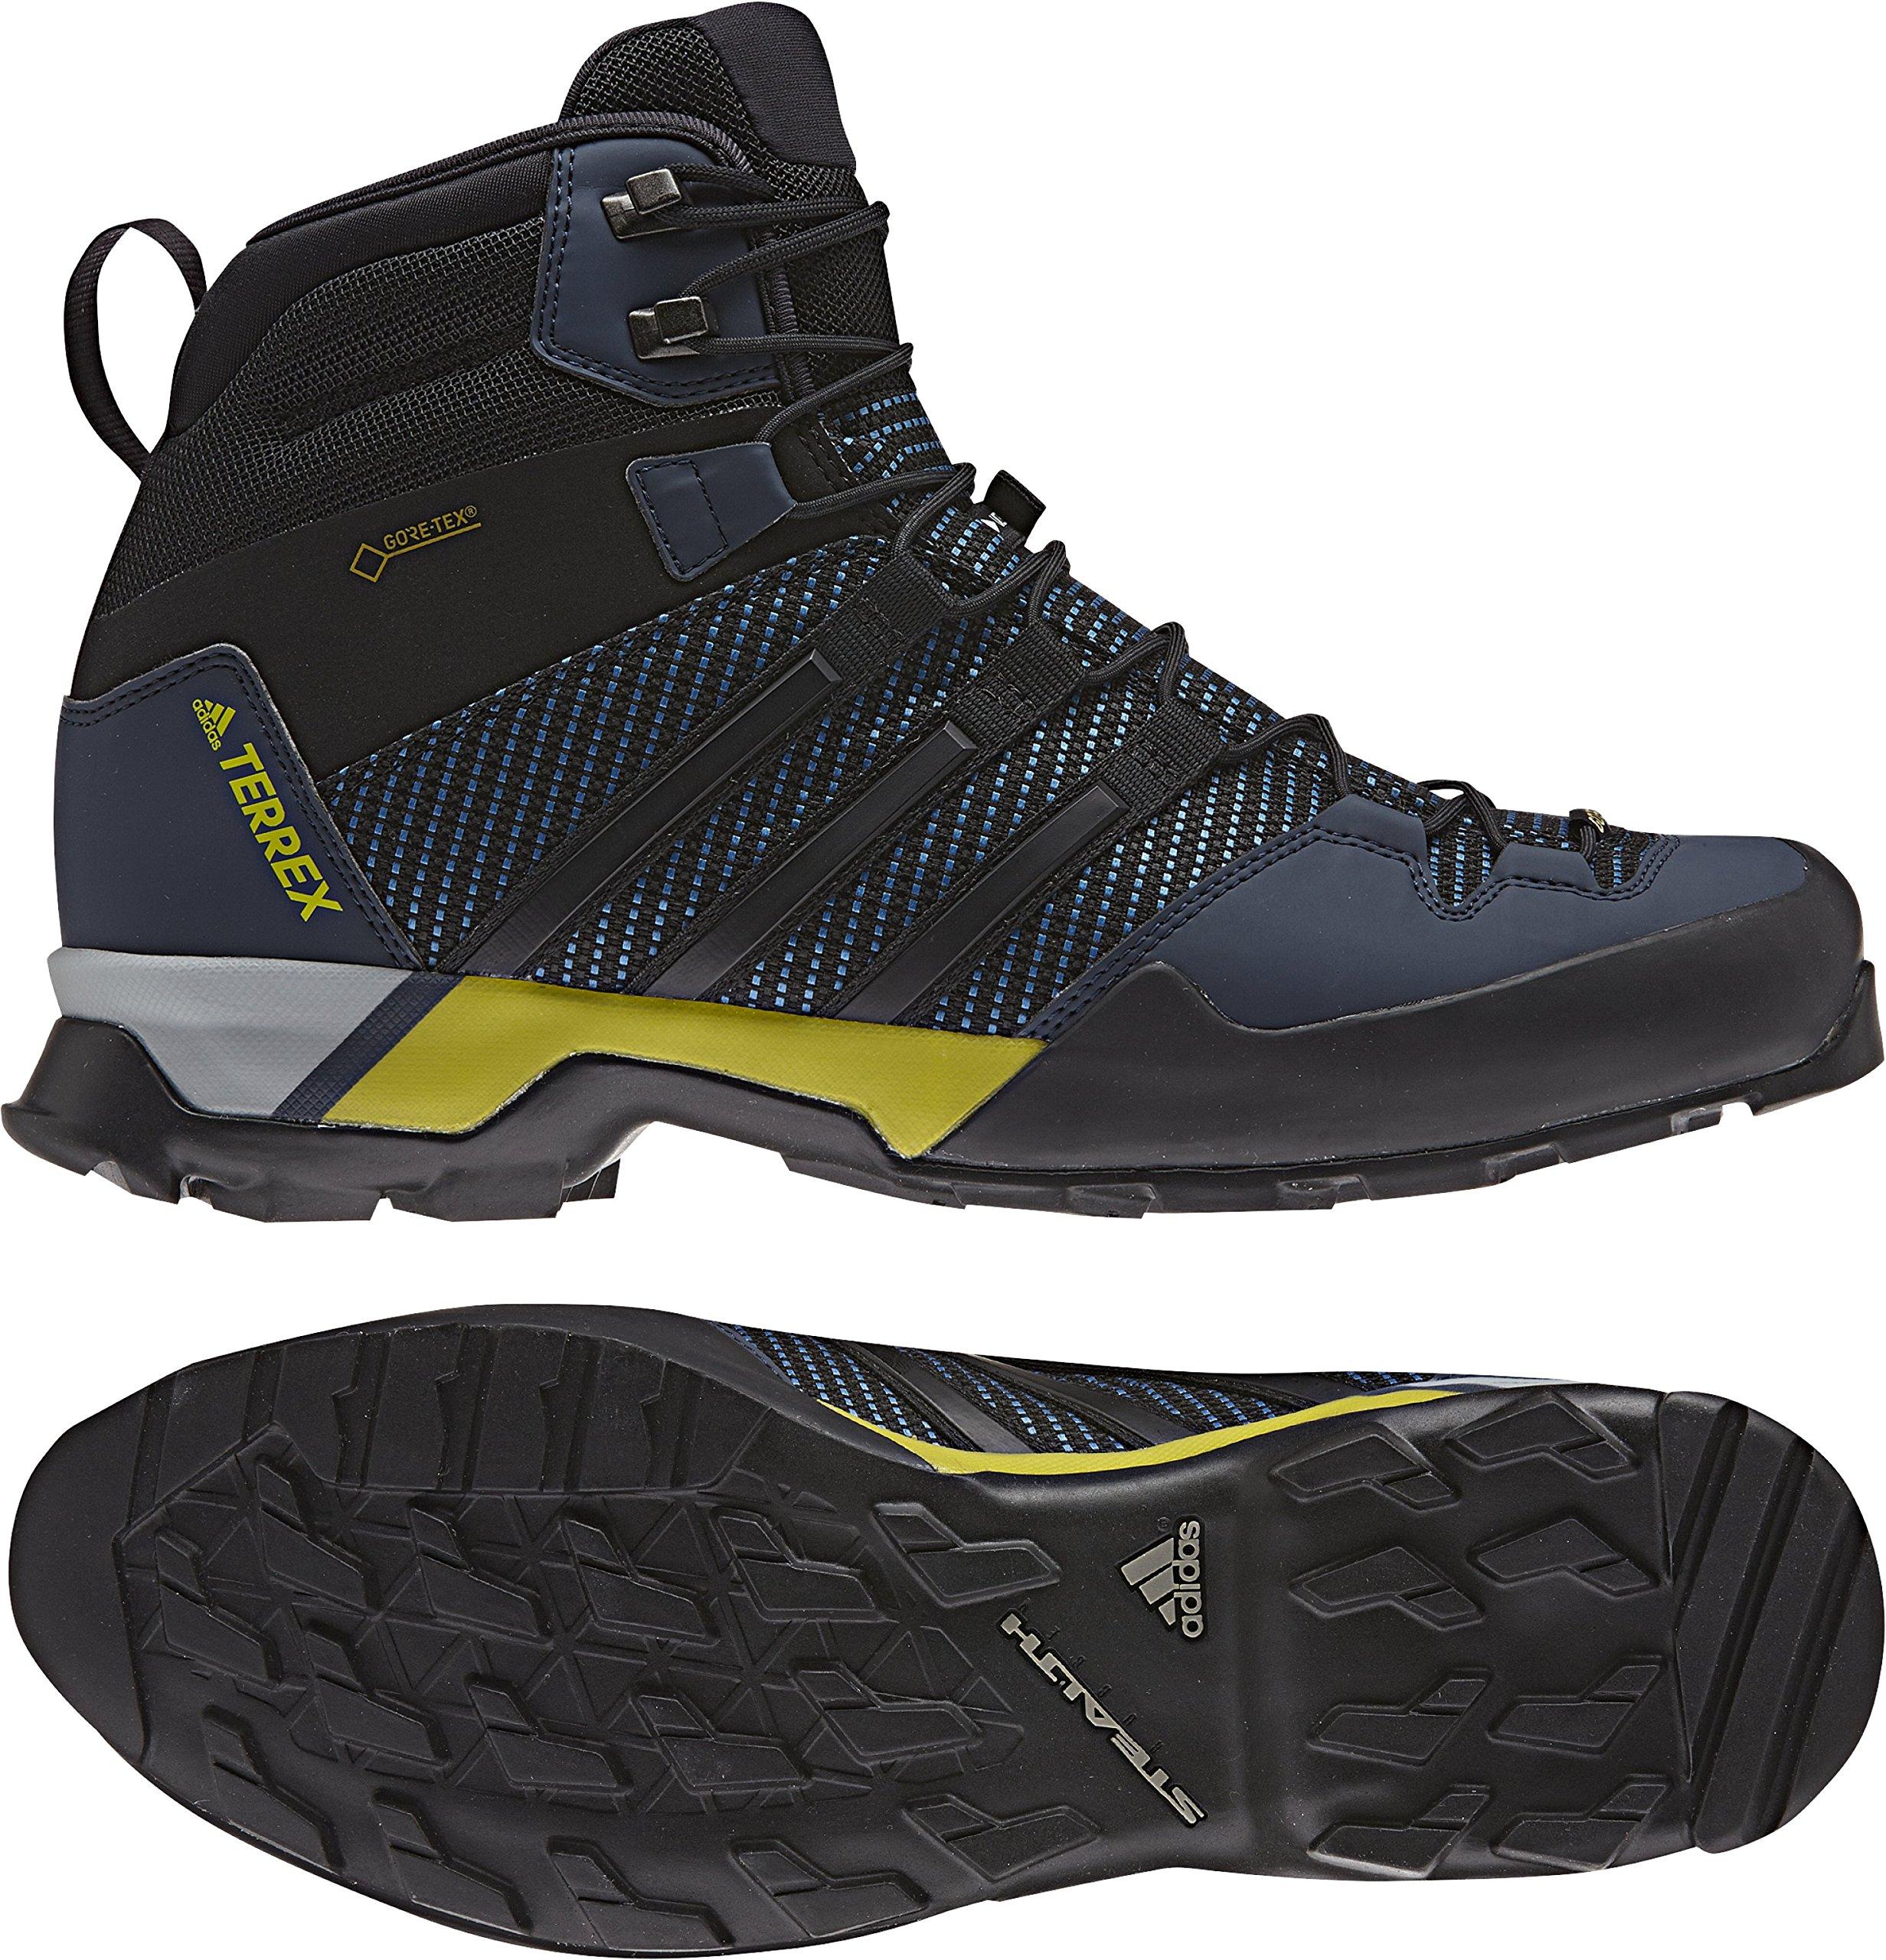 bc46f68d2073 Galleon - Adidas Outdoor Mens Terrex Scope High GTX Shoe (9.5 - Core  Blue Black Col. Navy)